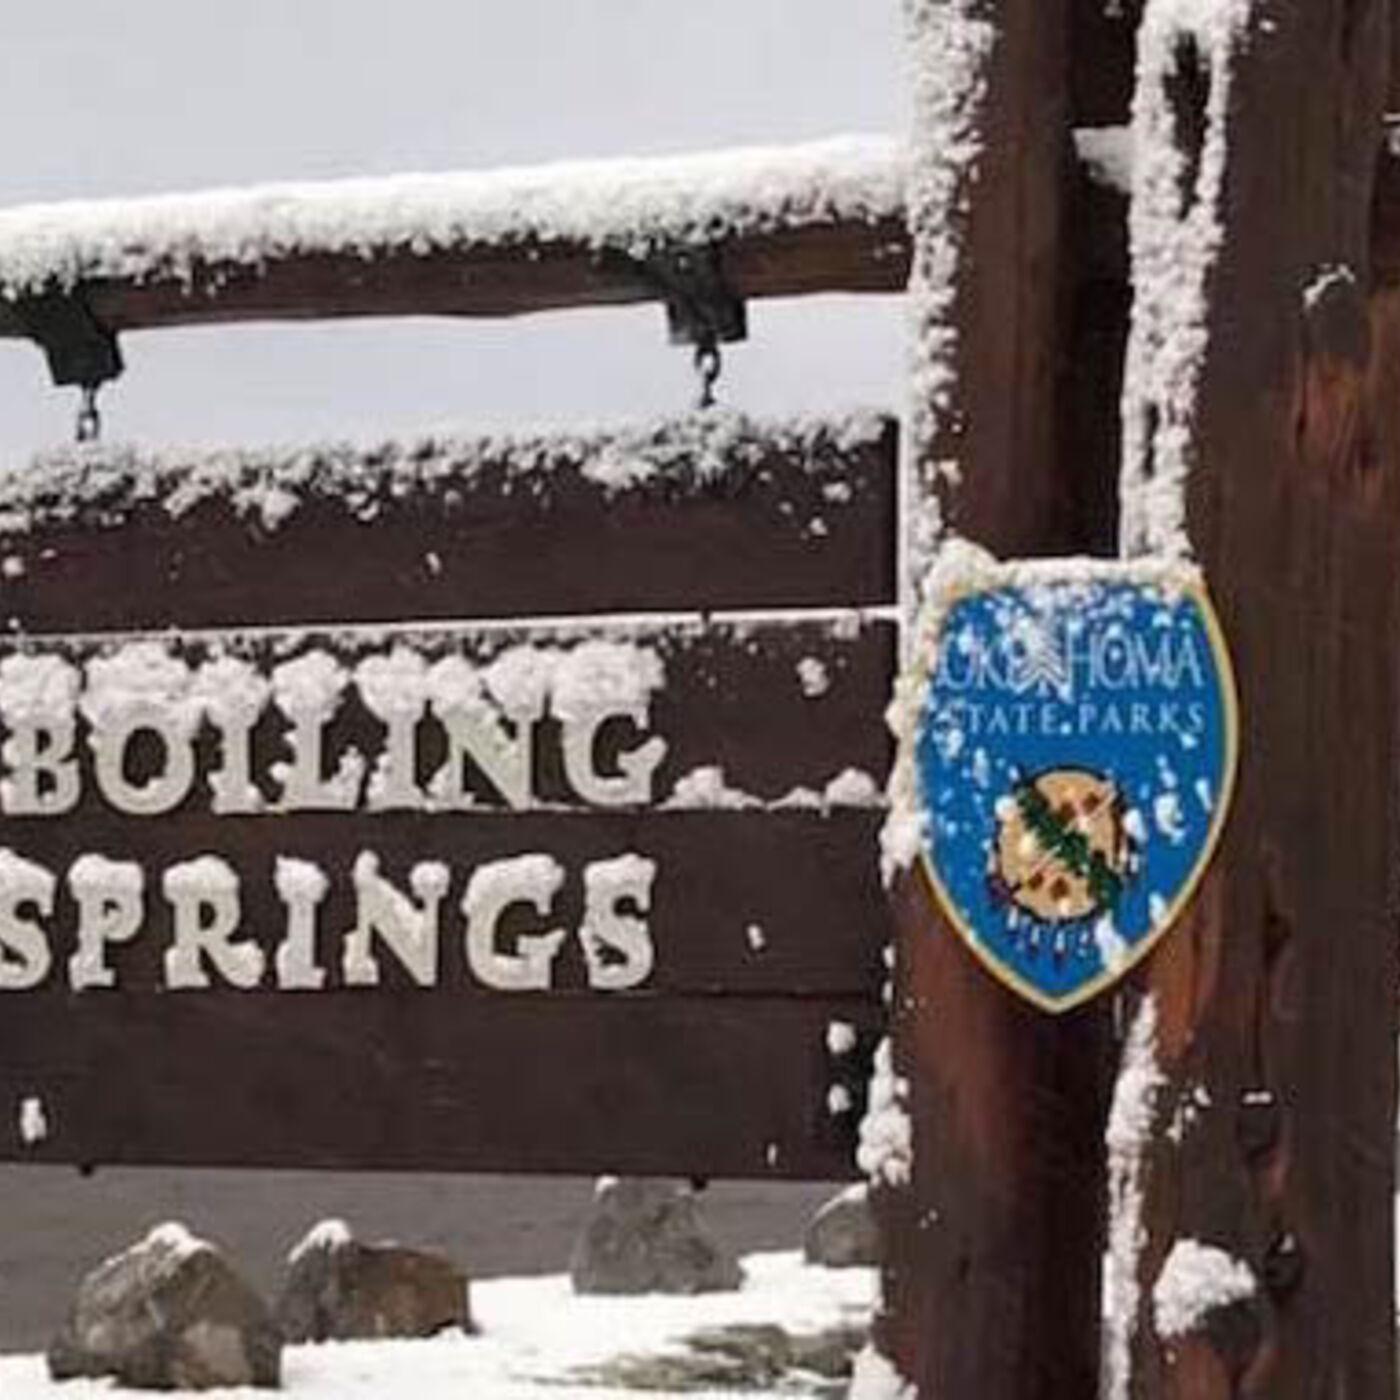 Oklahoma State Park Spotlight - Boiling Springs